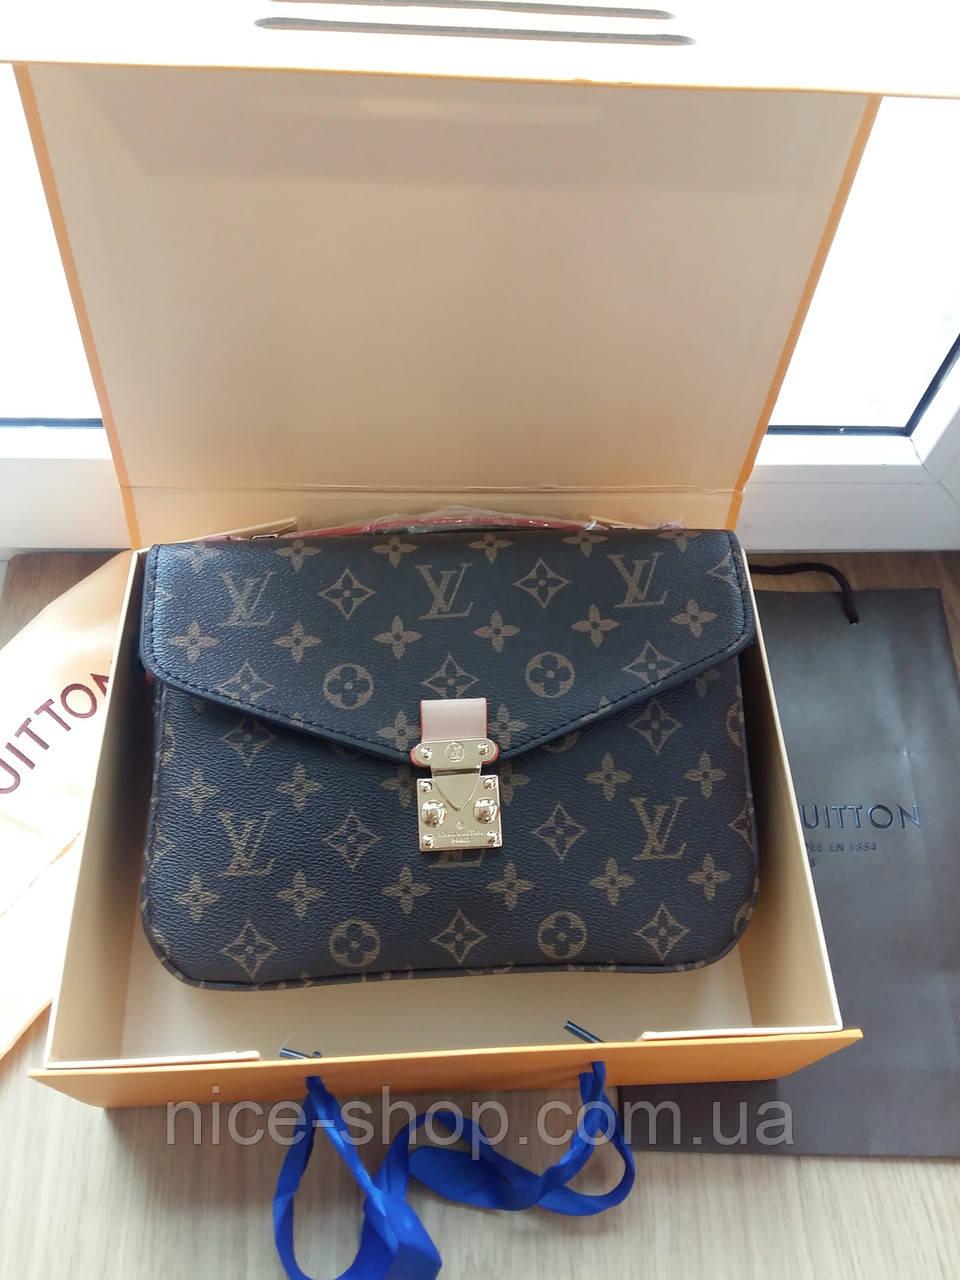 Люкс-реплика Louis Vuitton Metis кожа монограмм в коробке